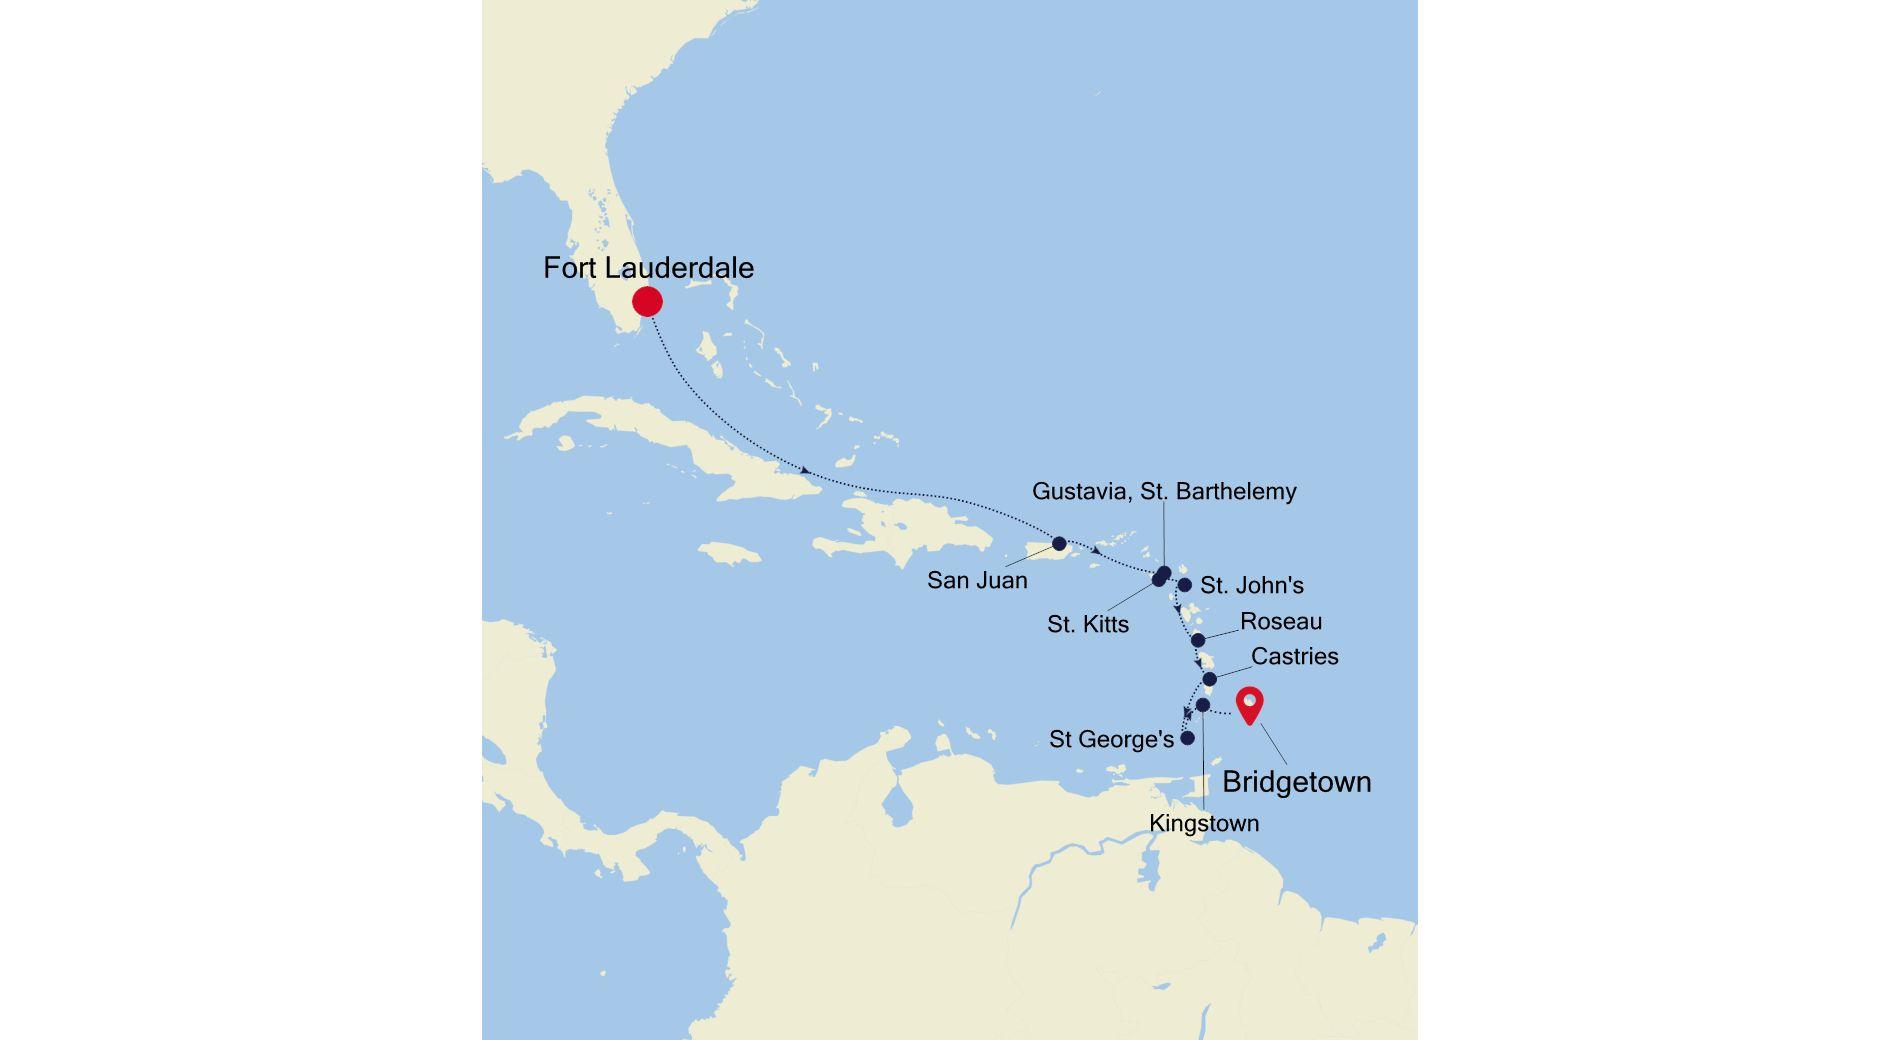 SL220125011 - Fort Lauderdale a Bridgetown